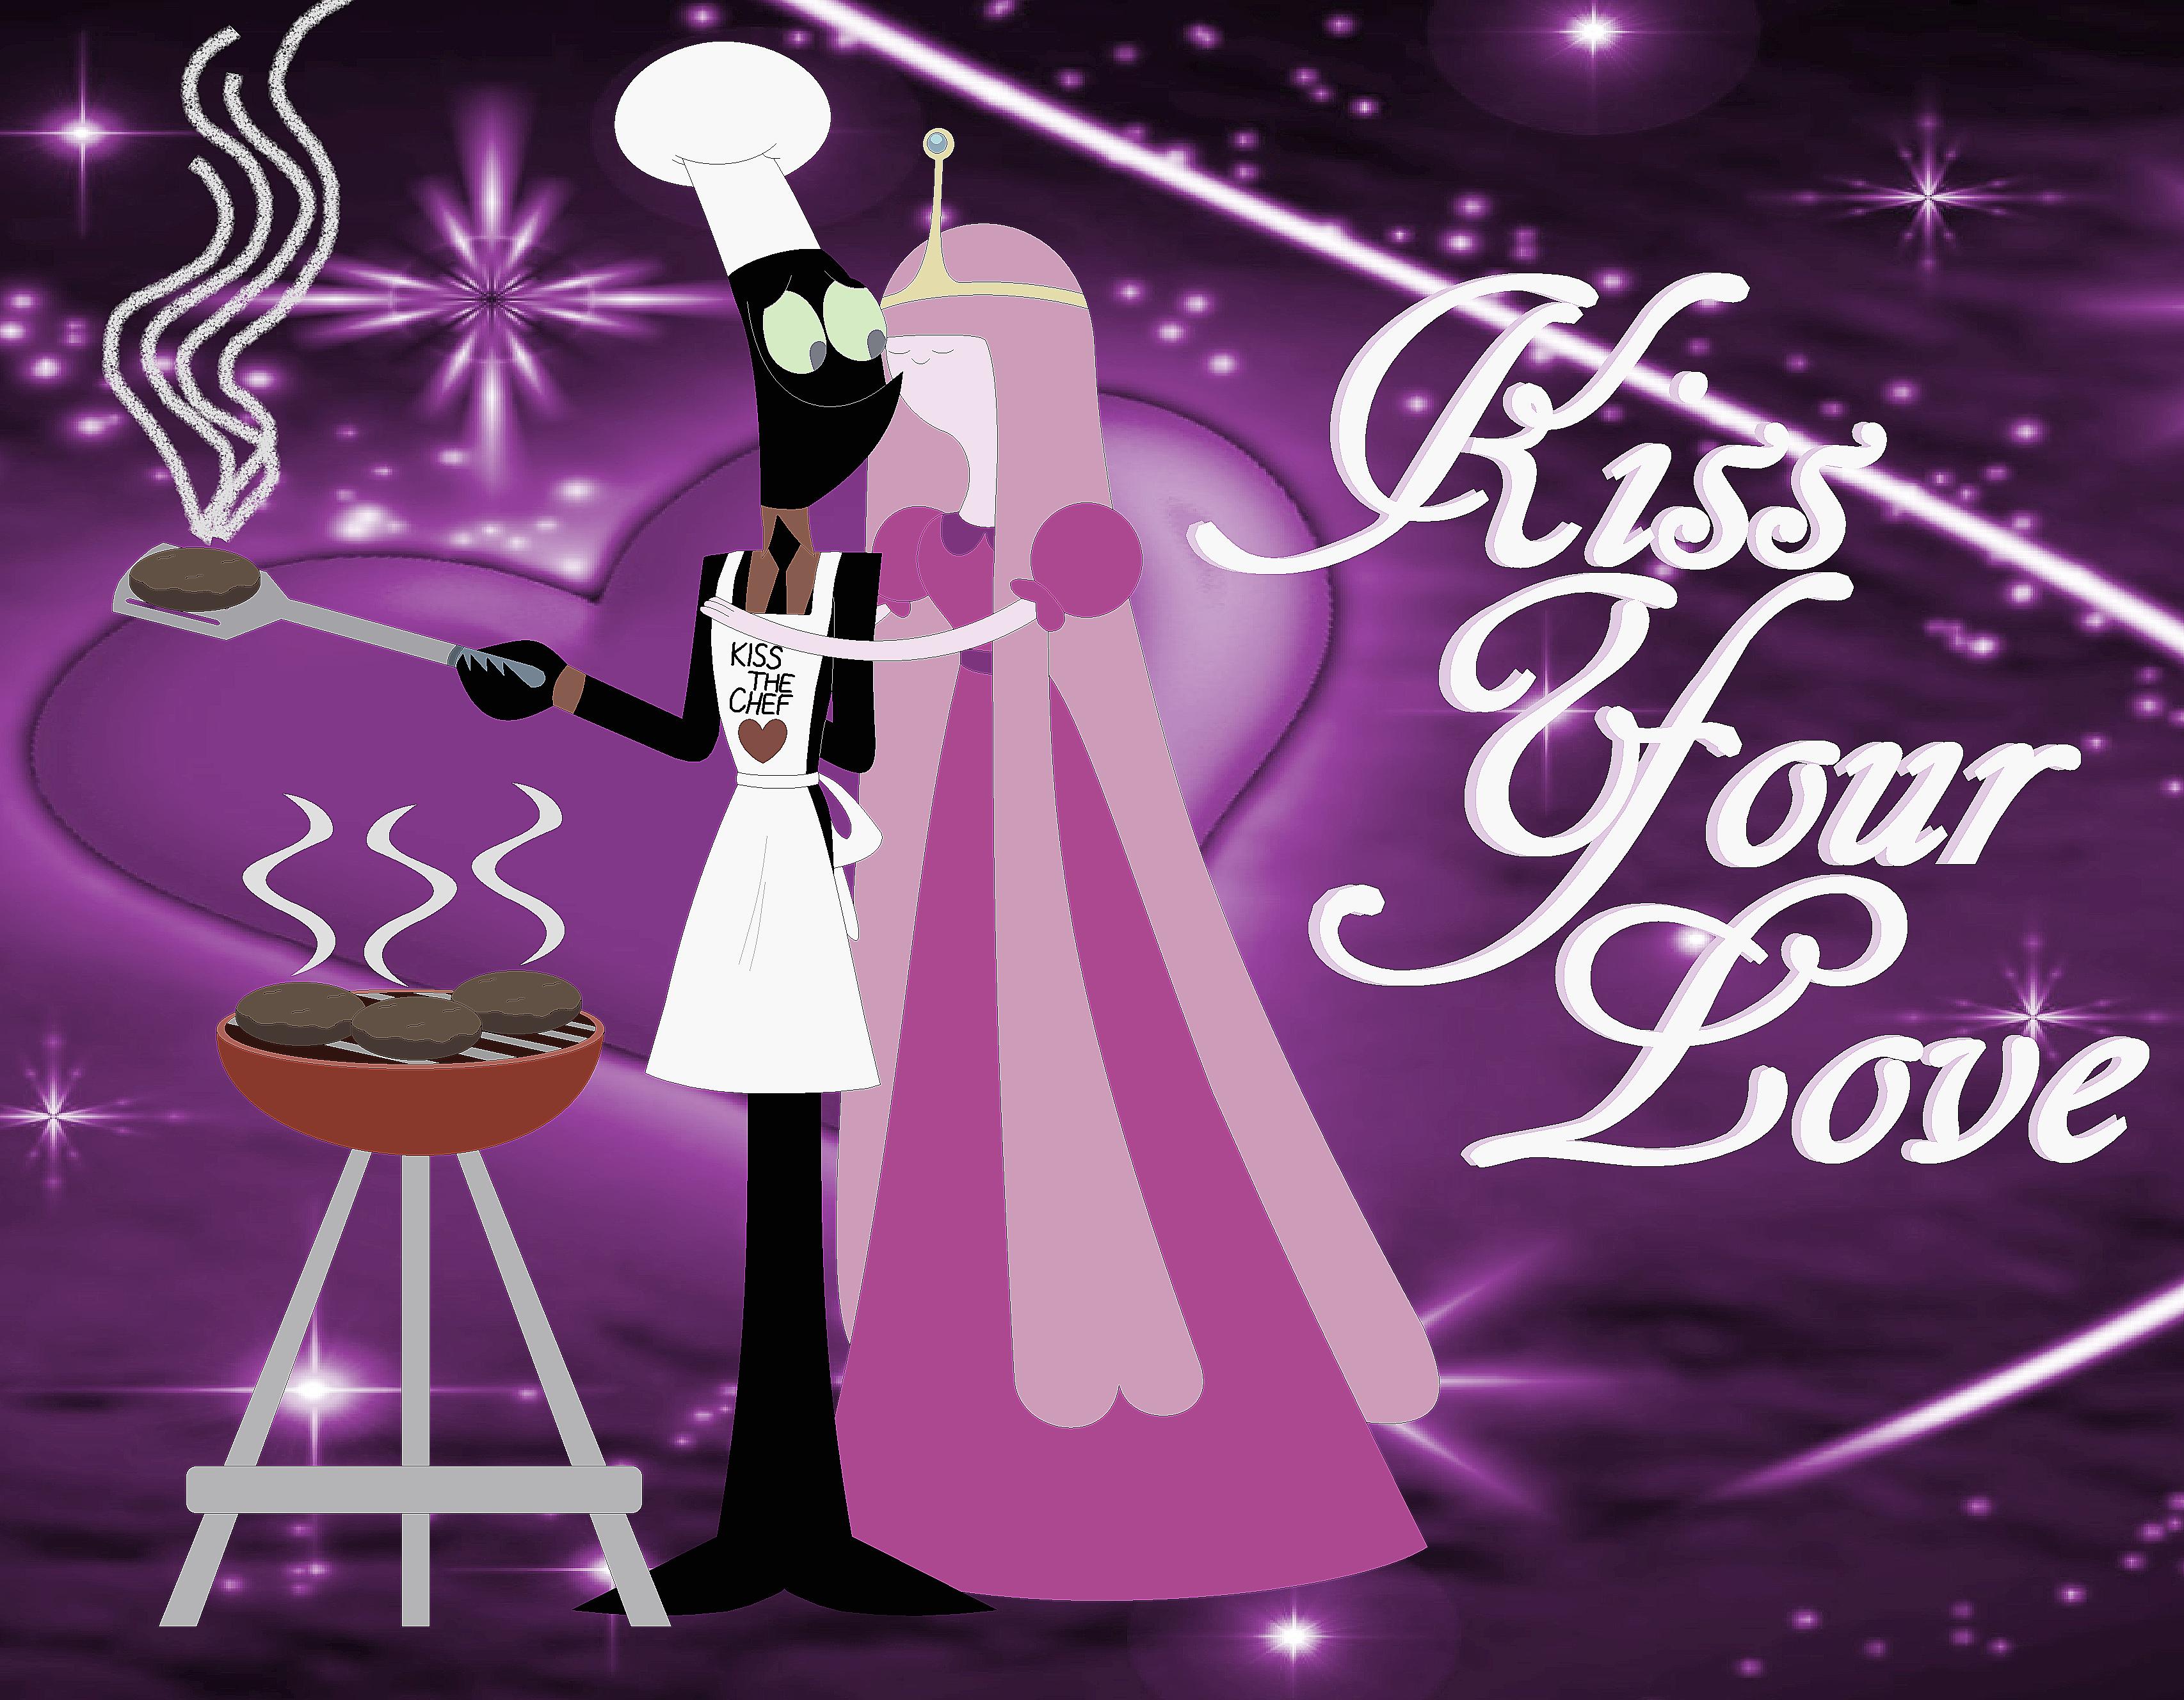 Nergal And Princess Bubblegum Kiss The Chef for Love <3 :)